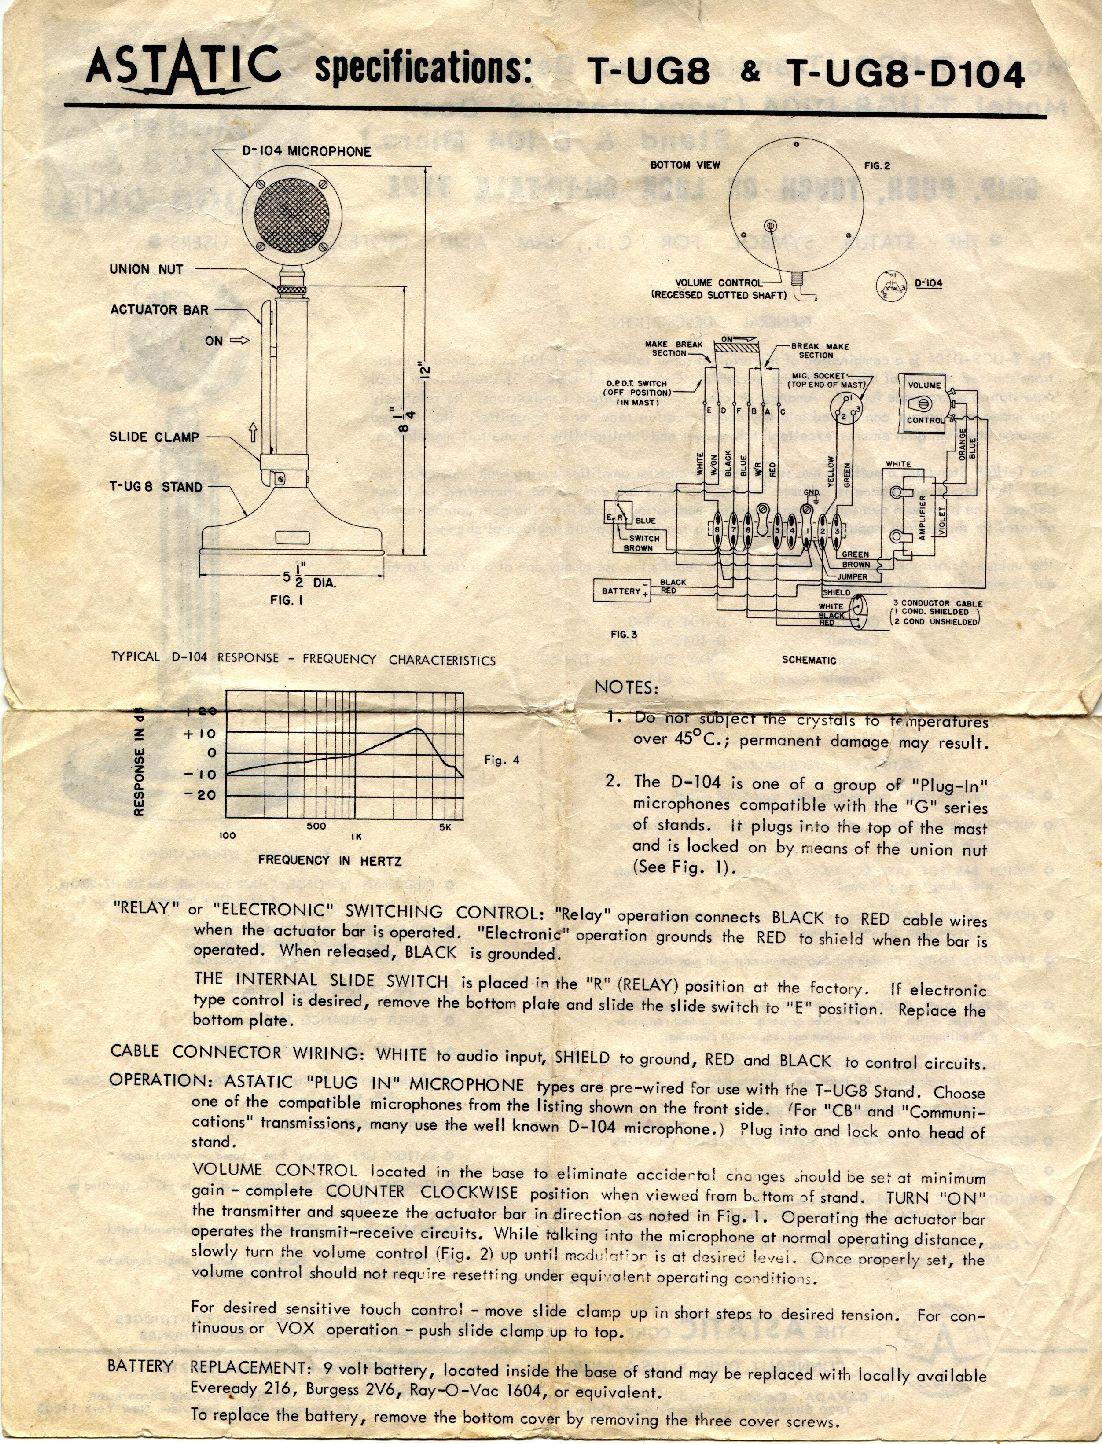 ameri cure control box wiring diagram whelen 9m wiring diagram ameri-cure reviews americure paint booth reviews ameri cure control box wiring diagram